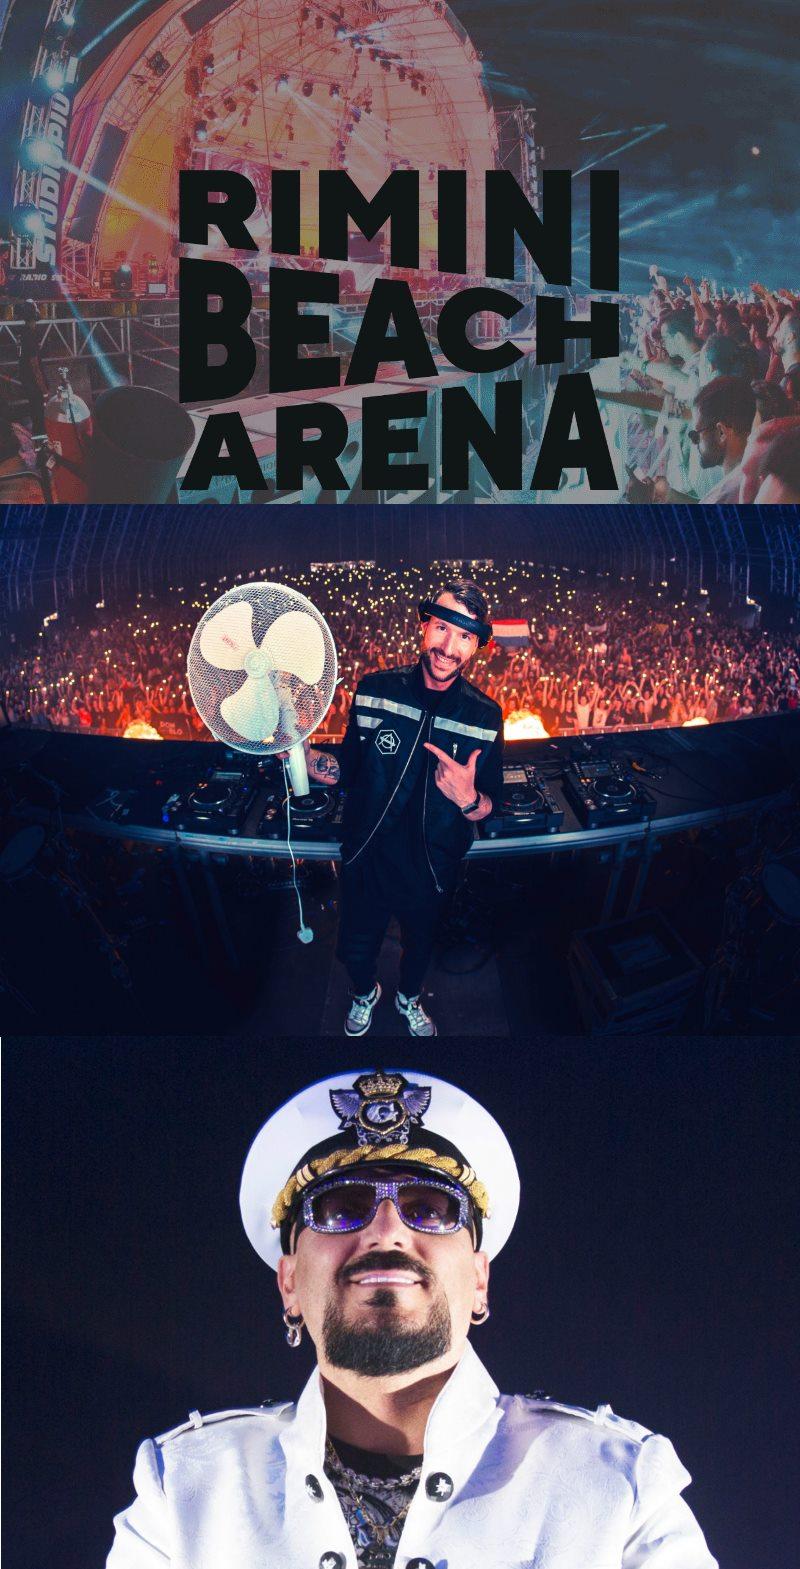 Clone of Rimini Beach Arena: Don Diablo e Gigi D'Agostino